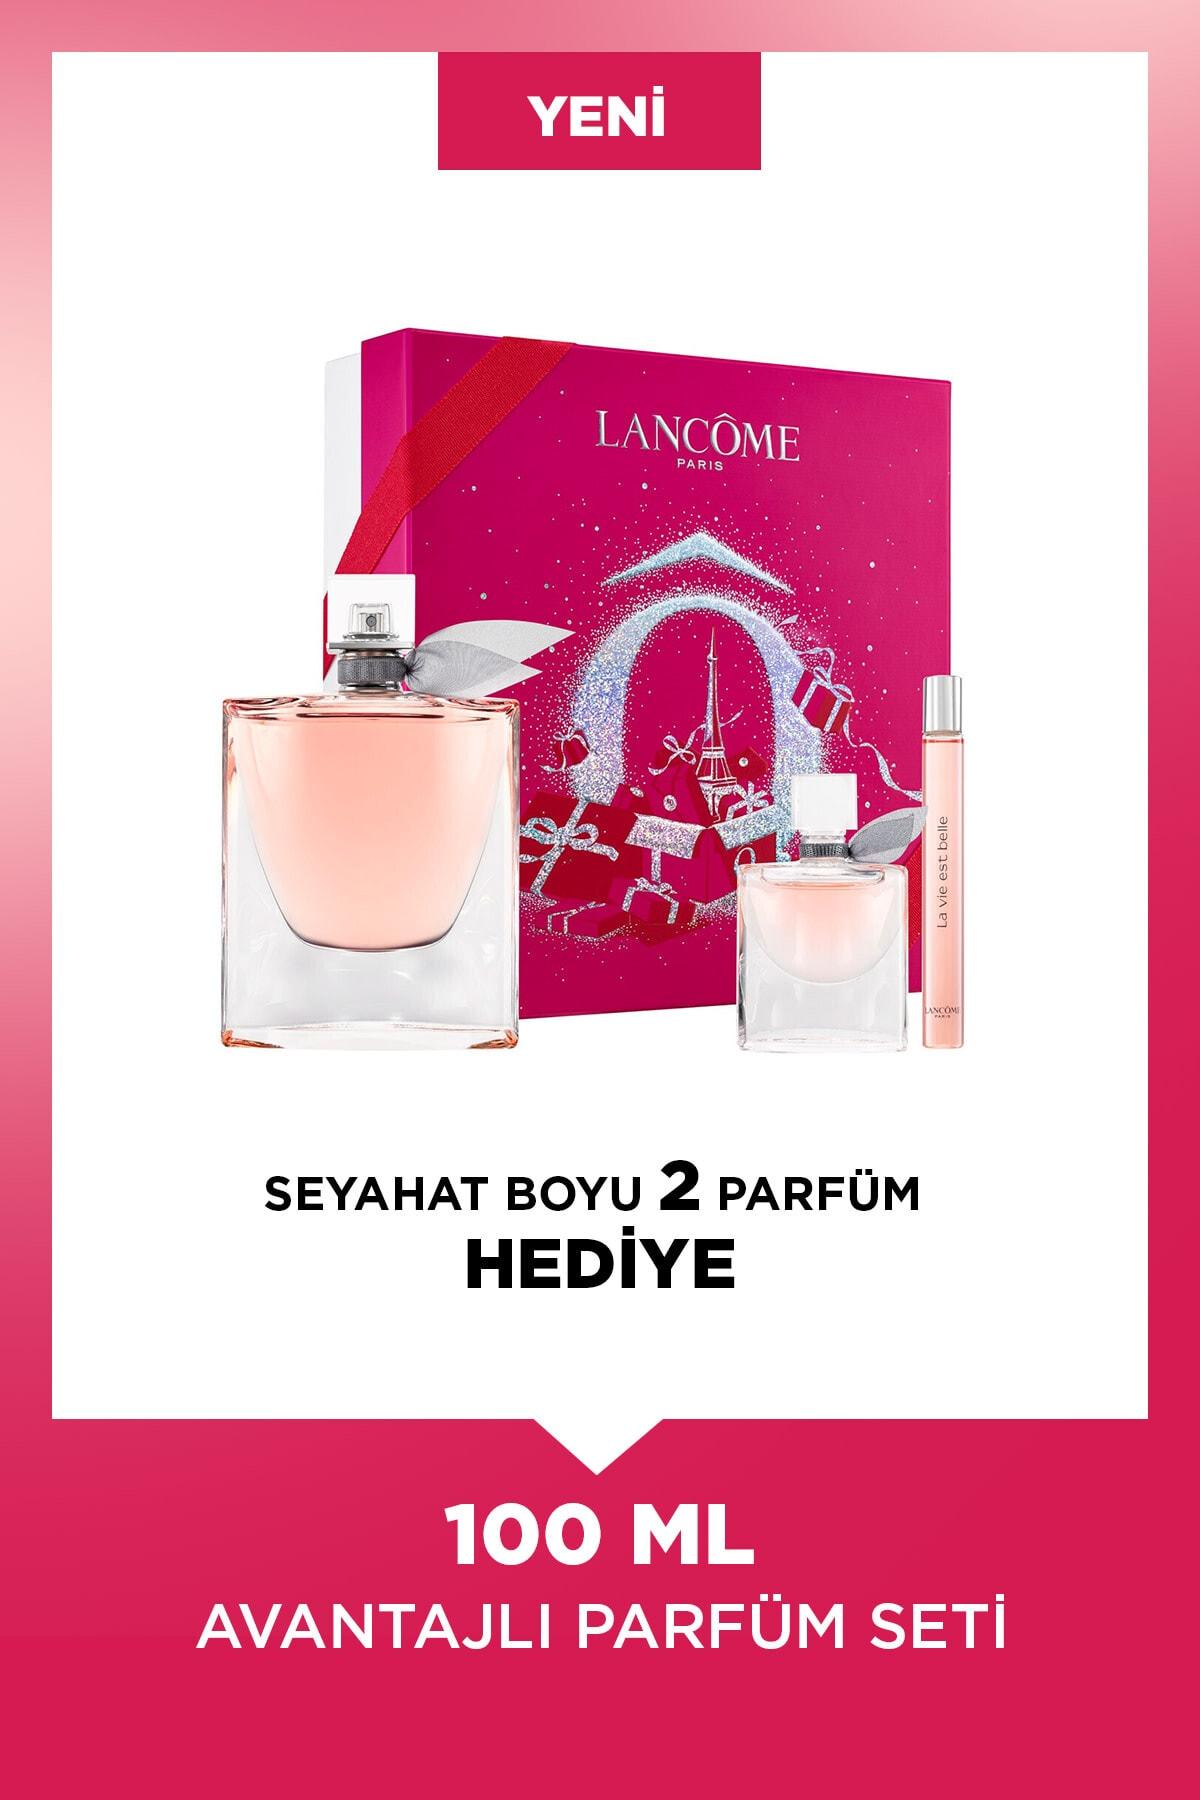 Lancome La Vie Est Belle Edp 100 ml Kadın Parfüm Seti 3614273257459 1